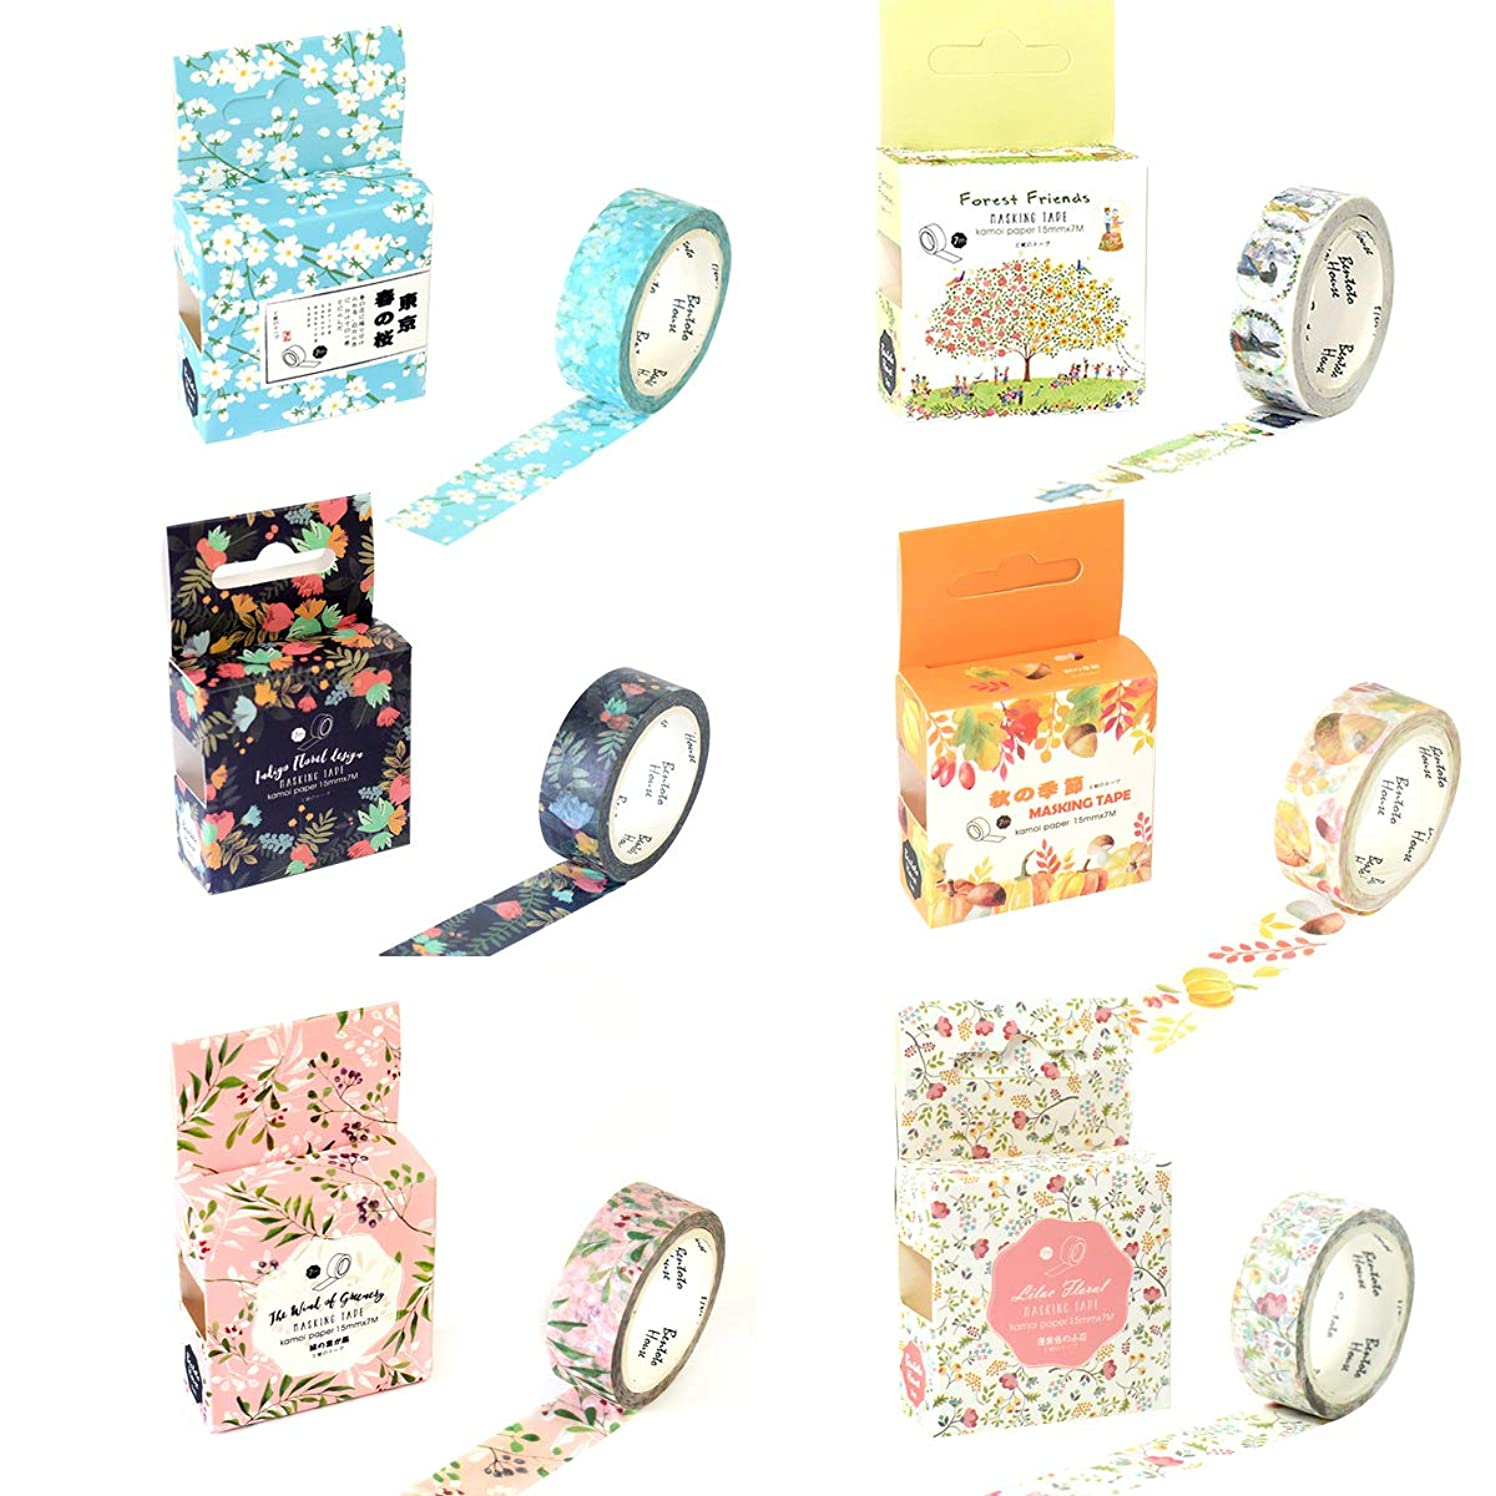 Kawaii Washi Tape Set (6 Rolls) Cute Masking Tapes Floral Forest Animal Autumn Fruit Pine Cone Mushroom Pumpkin Rabbit Giraffe Decorative Tape DIY Label for Art Craft Scrapbook Planner Journal Diary